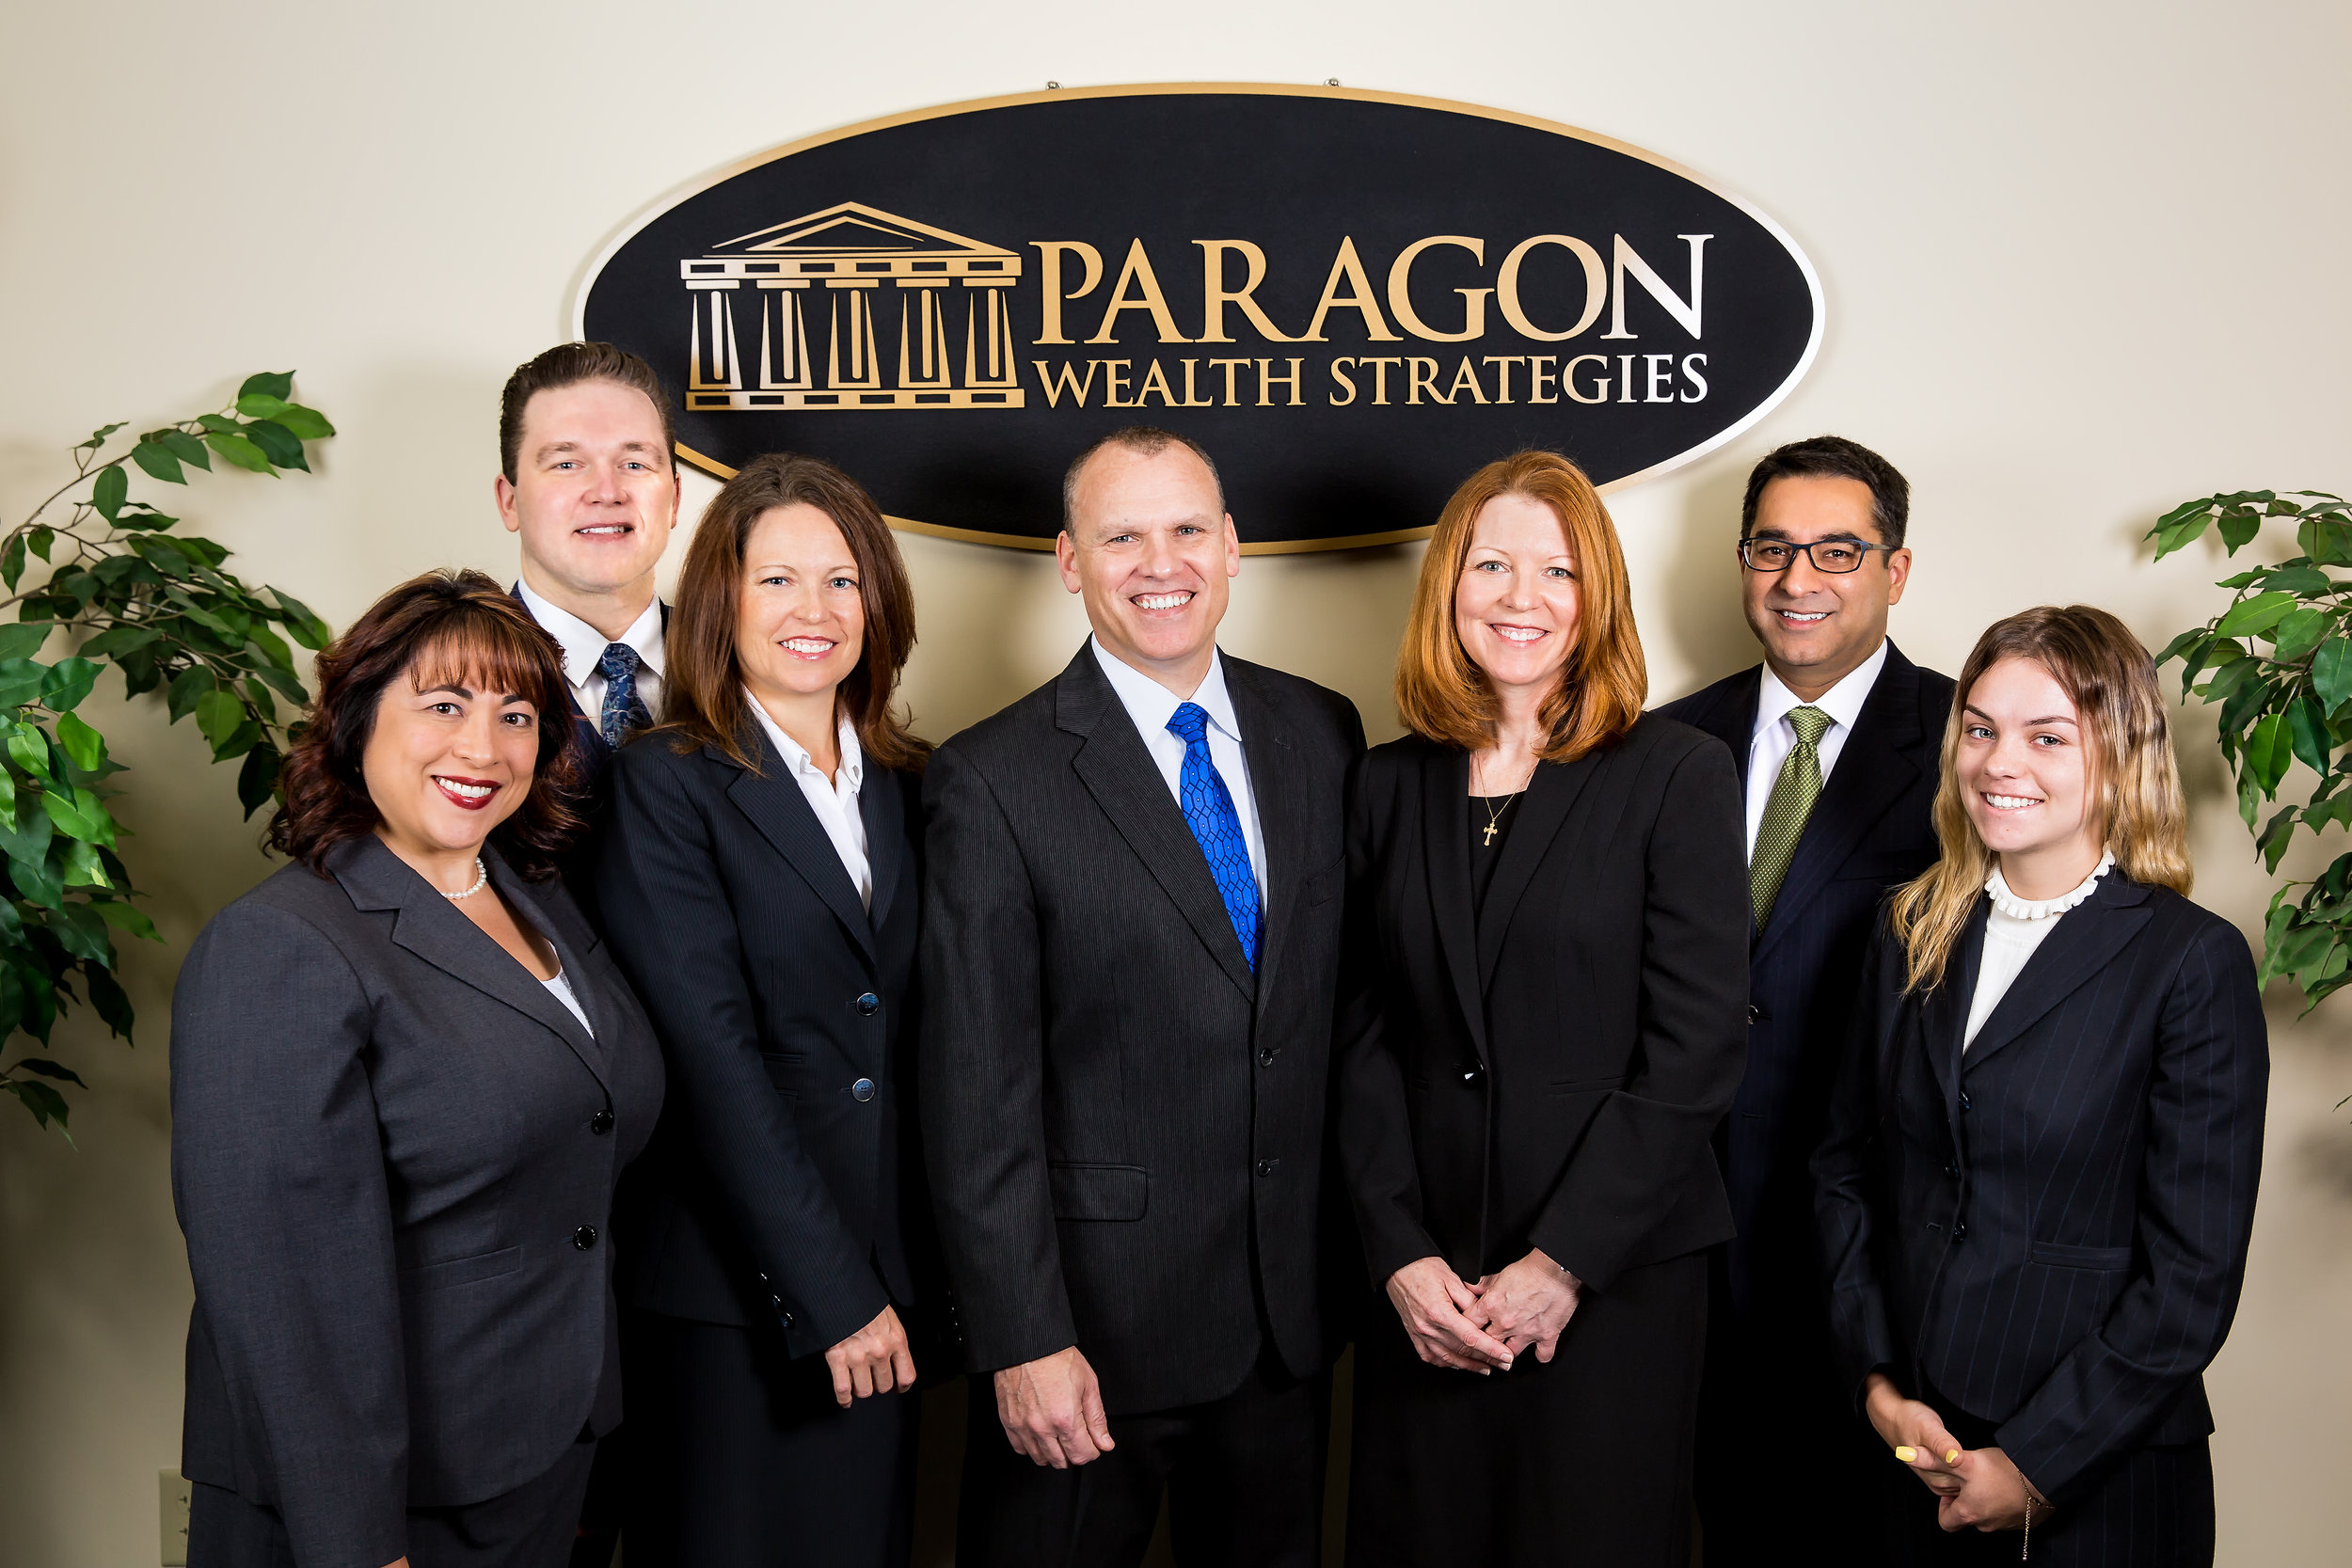 Paragon Wealth Strategies in Jacksonville, FL